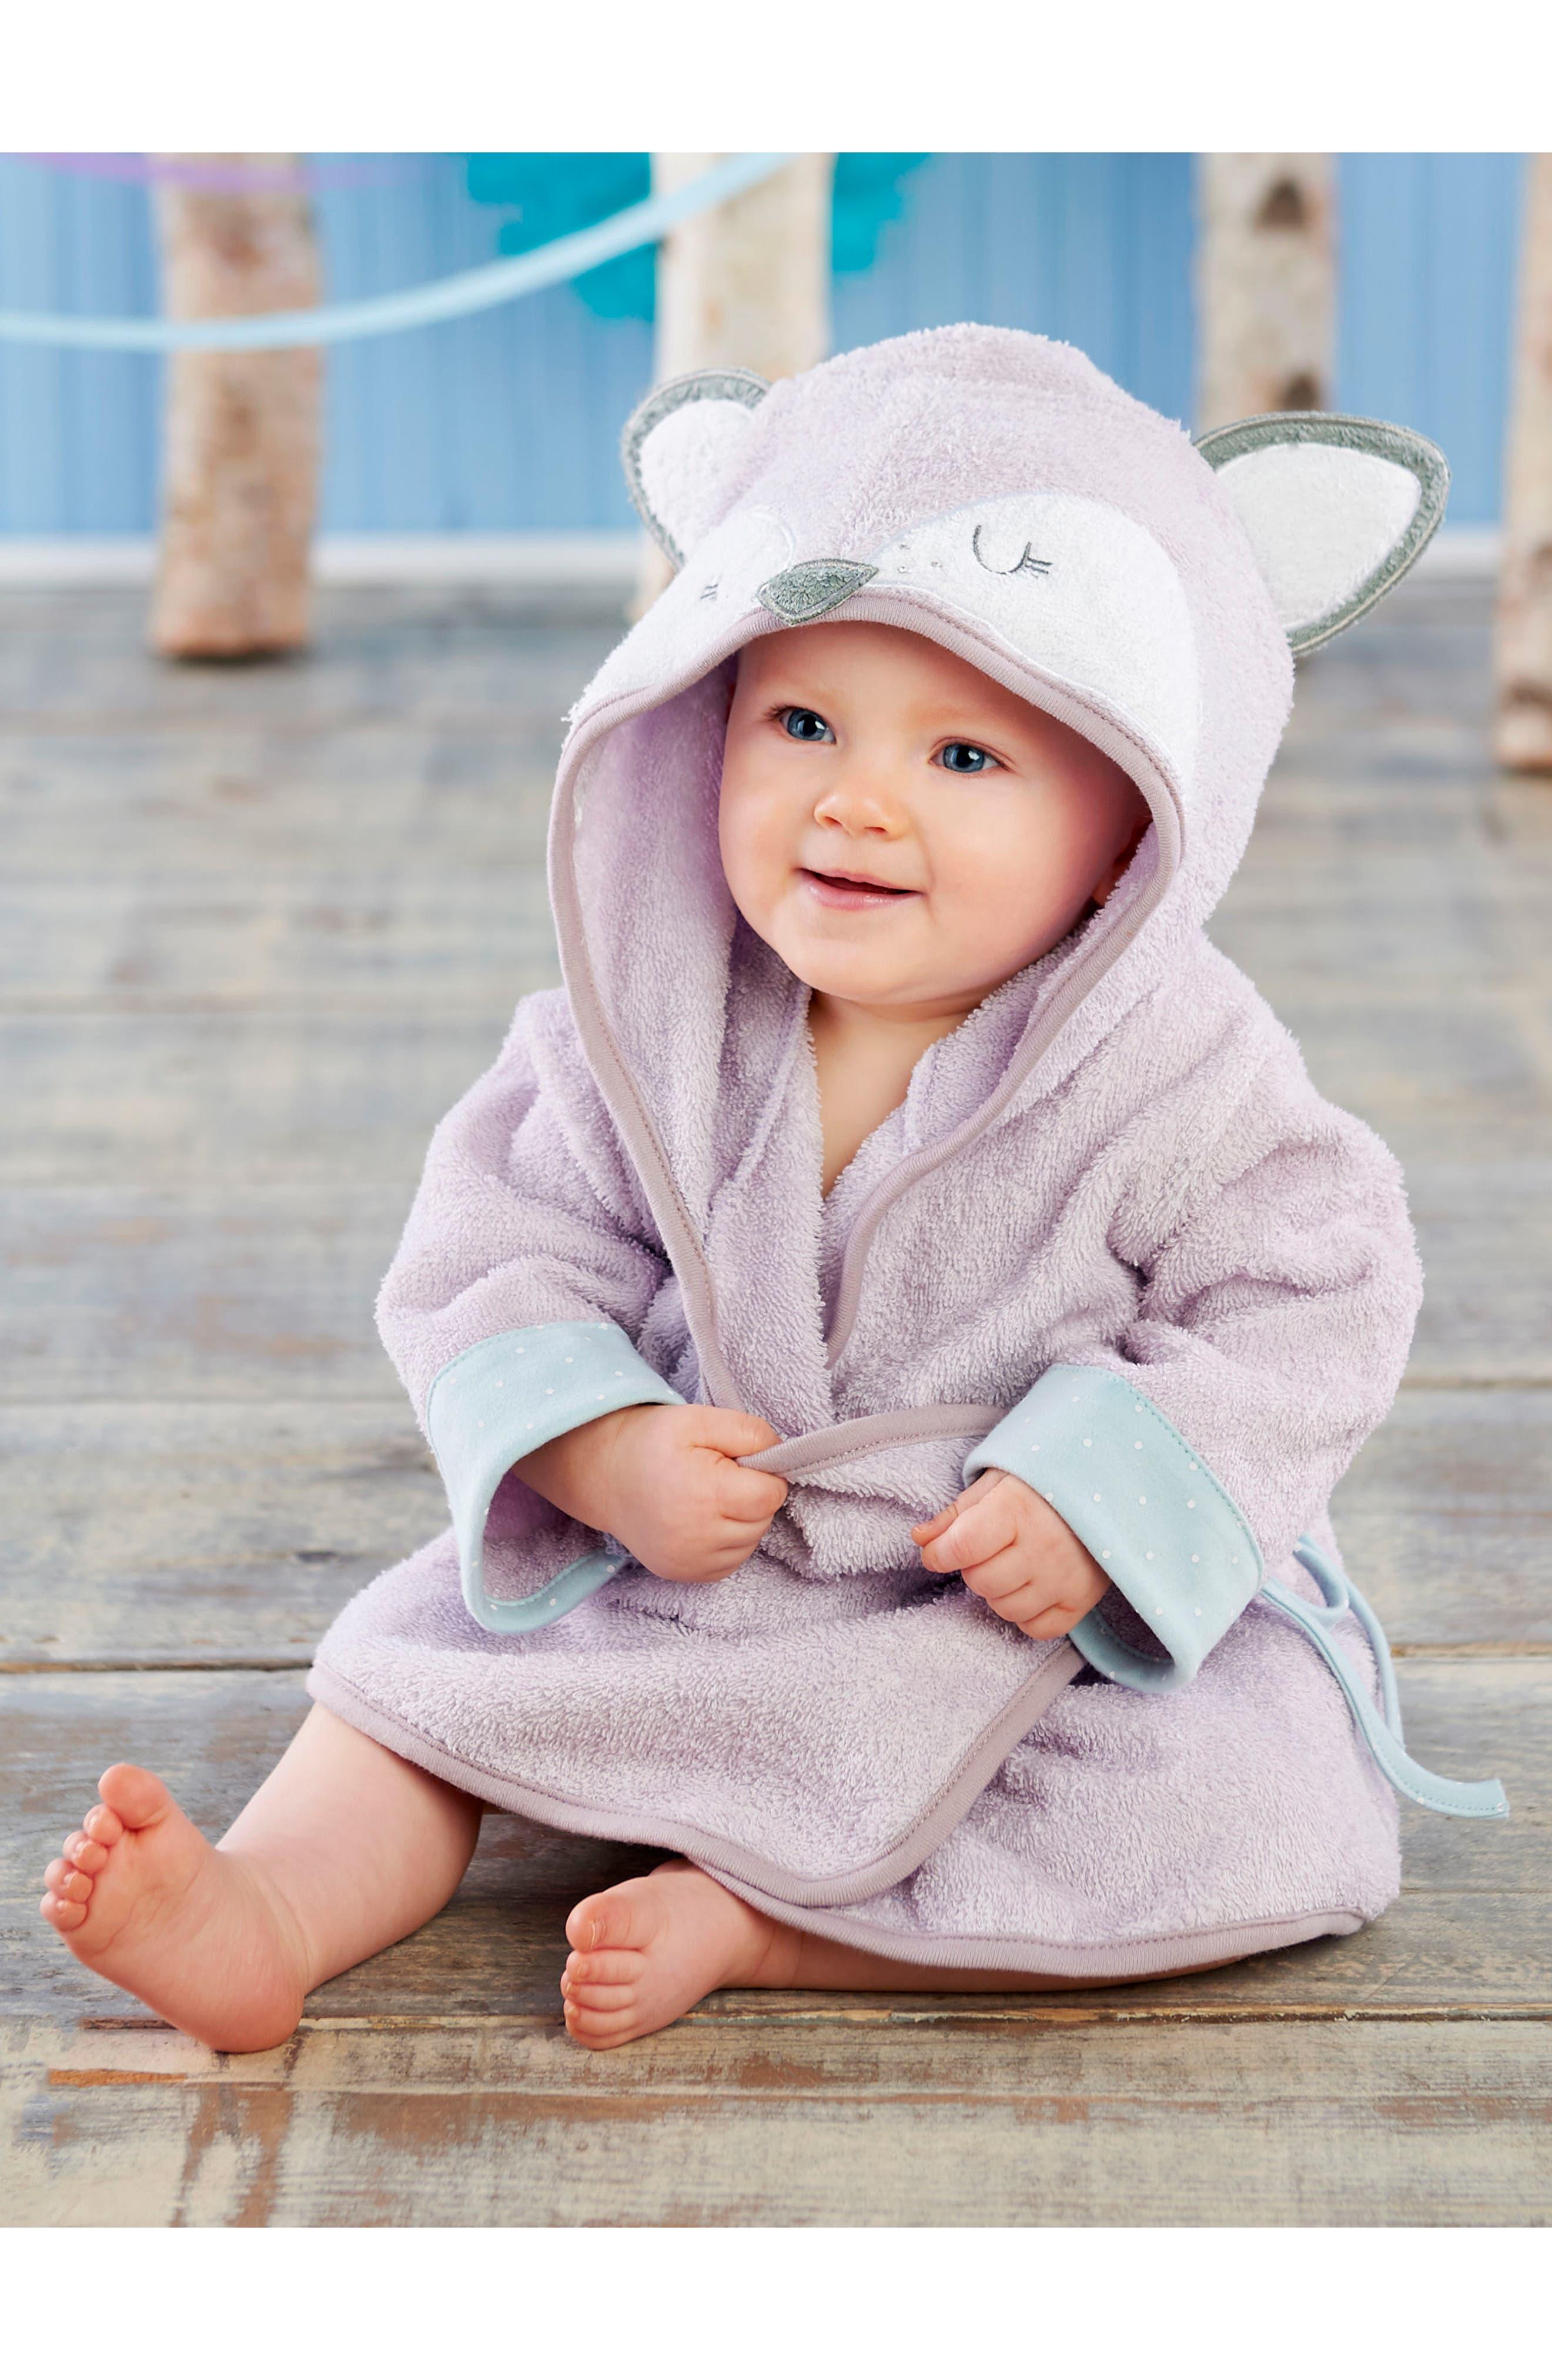 Forest Friends Fox Plush Robe, Fuzzy Socks, Stuffed Animal & Rattle Set,                             Alternate thumbnail 2, color,                             540